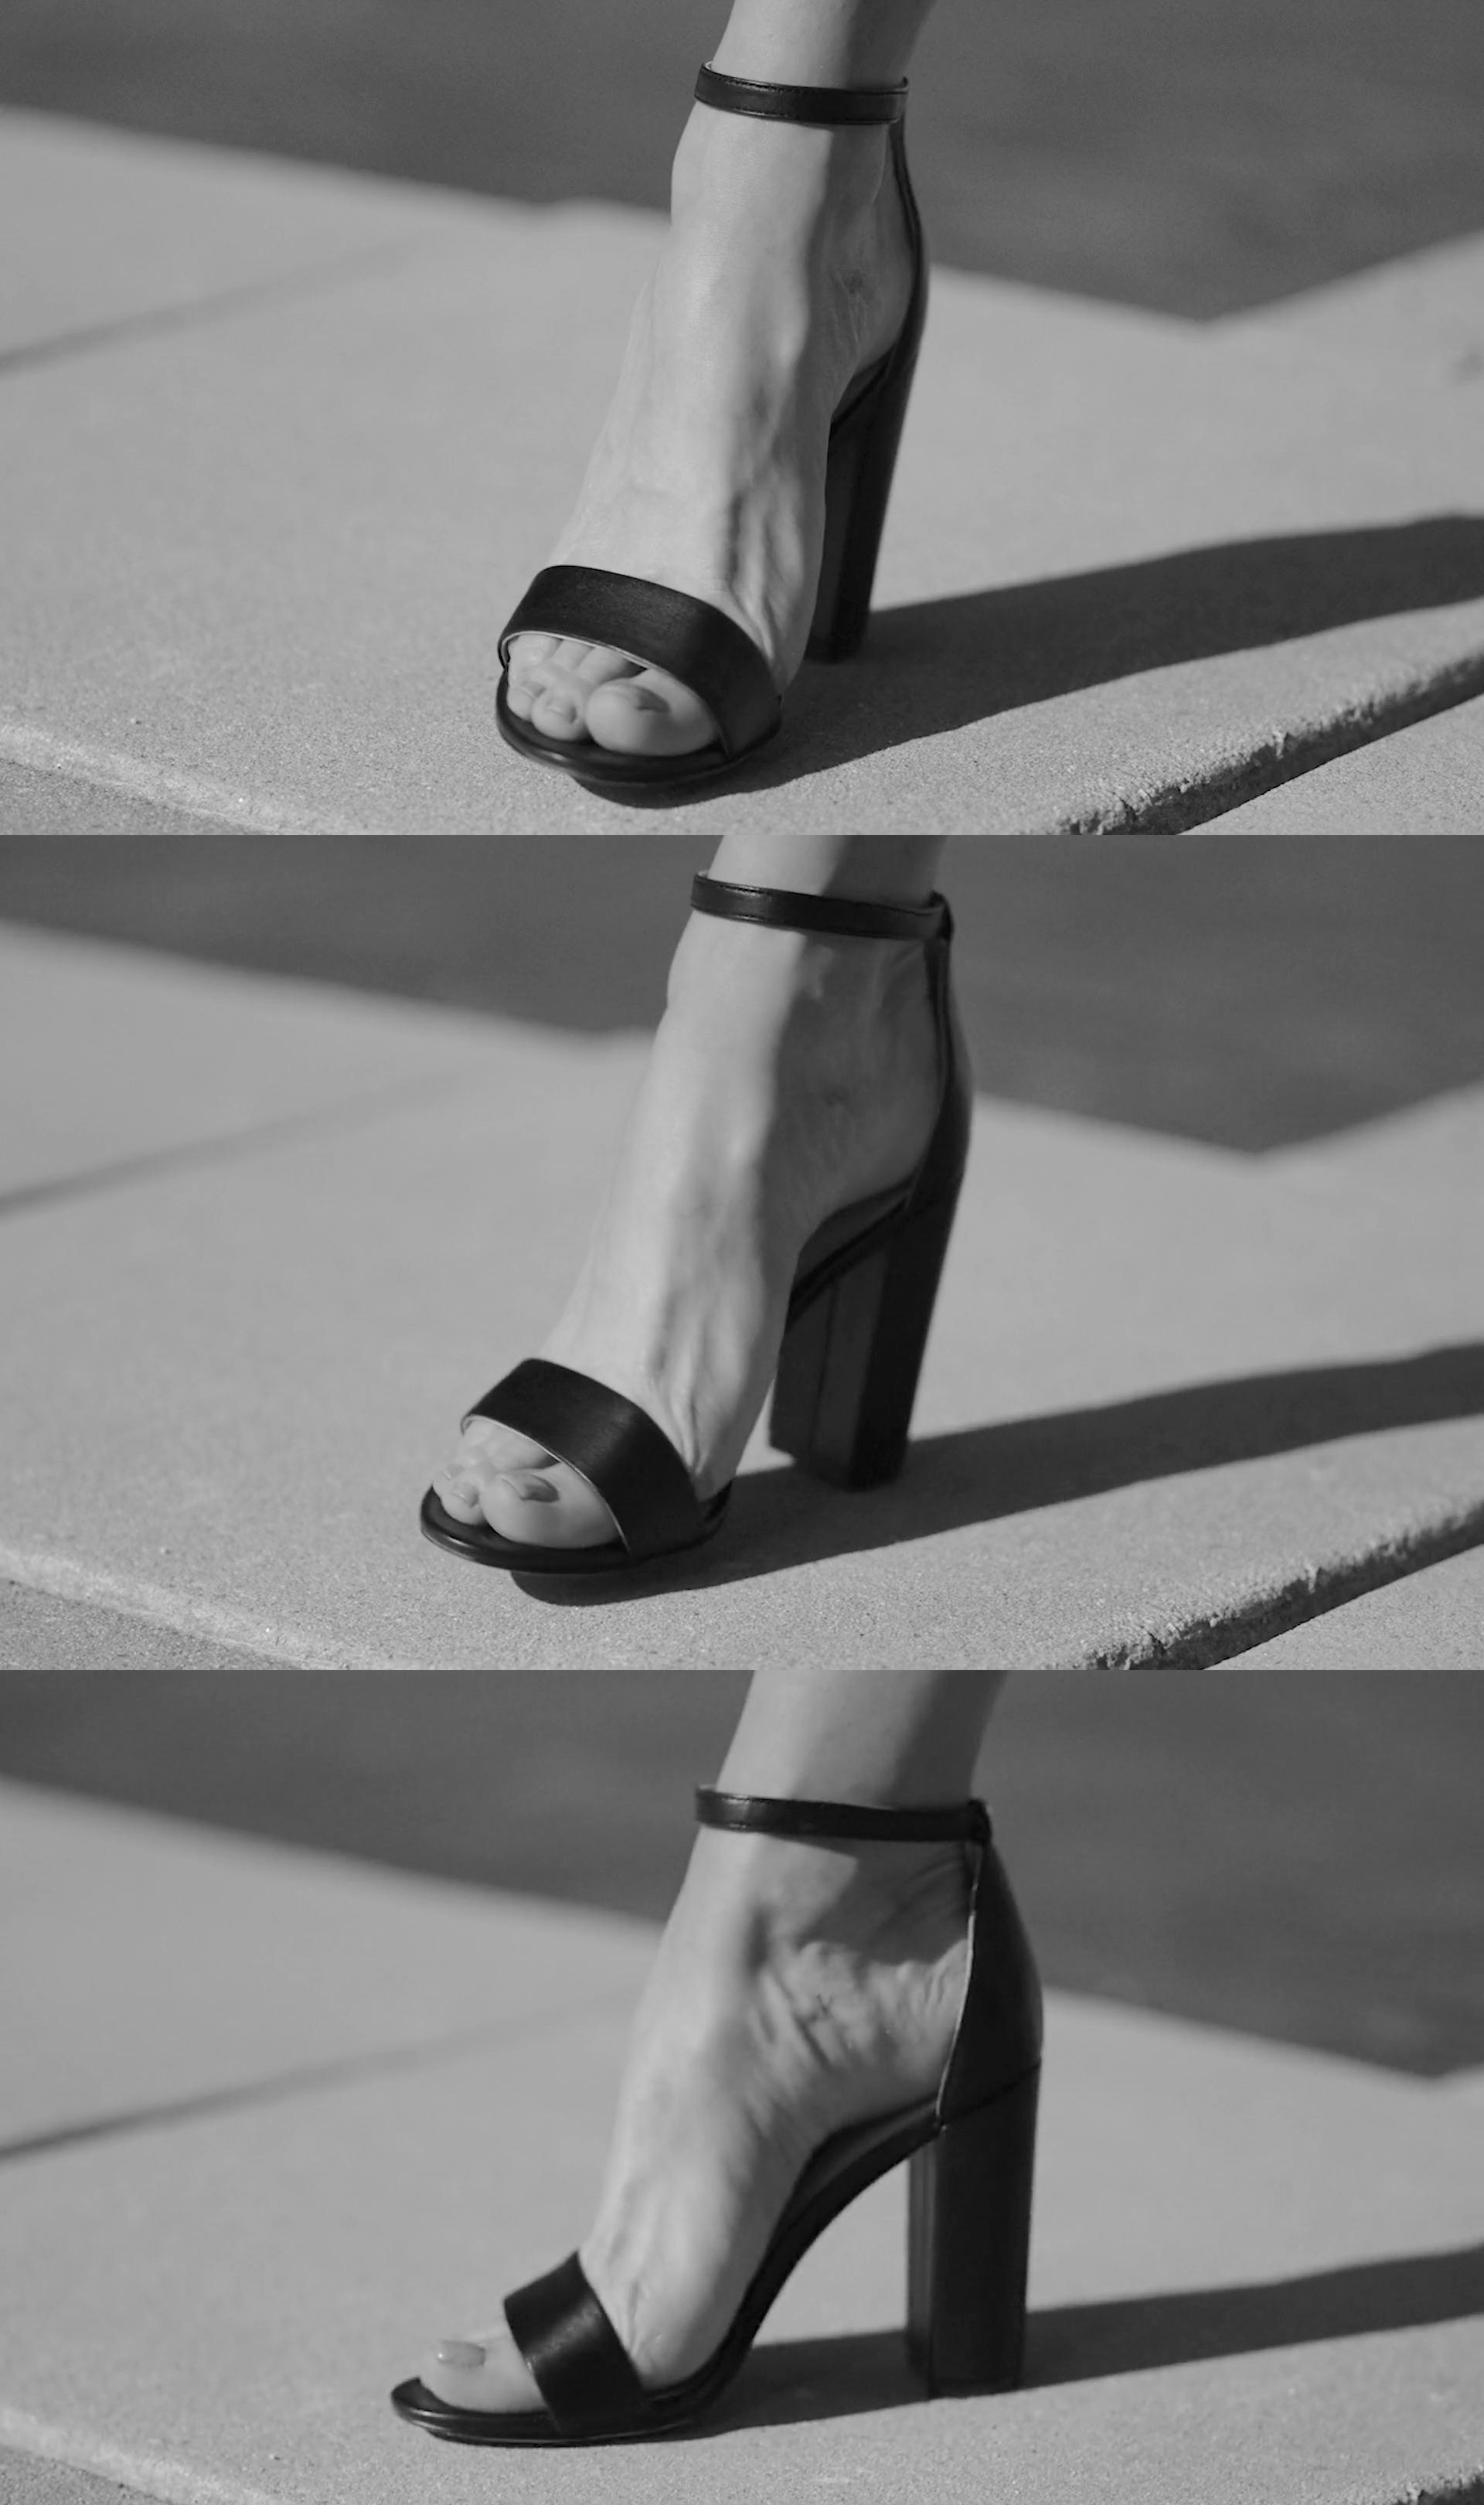 Feet Carolyn Murphy nudes (11 photos), Instagram